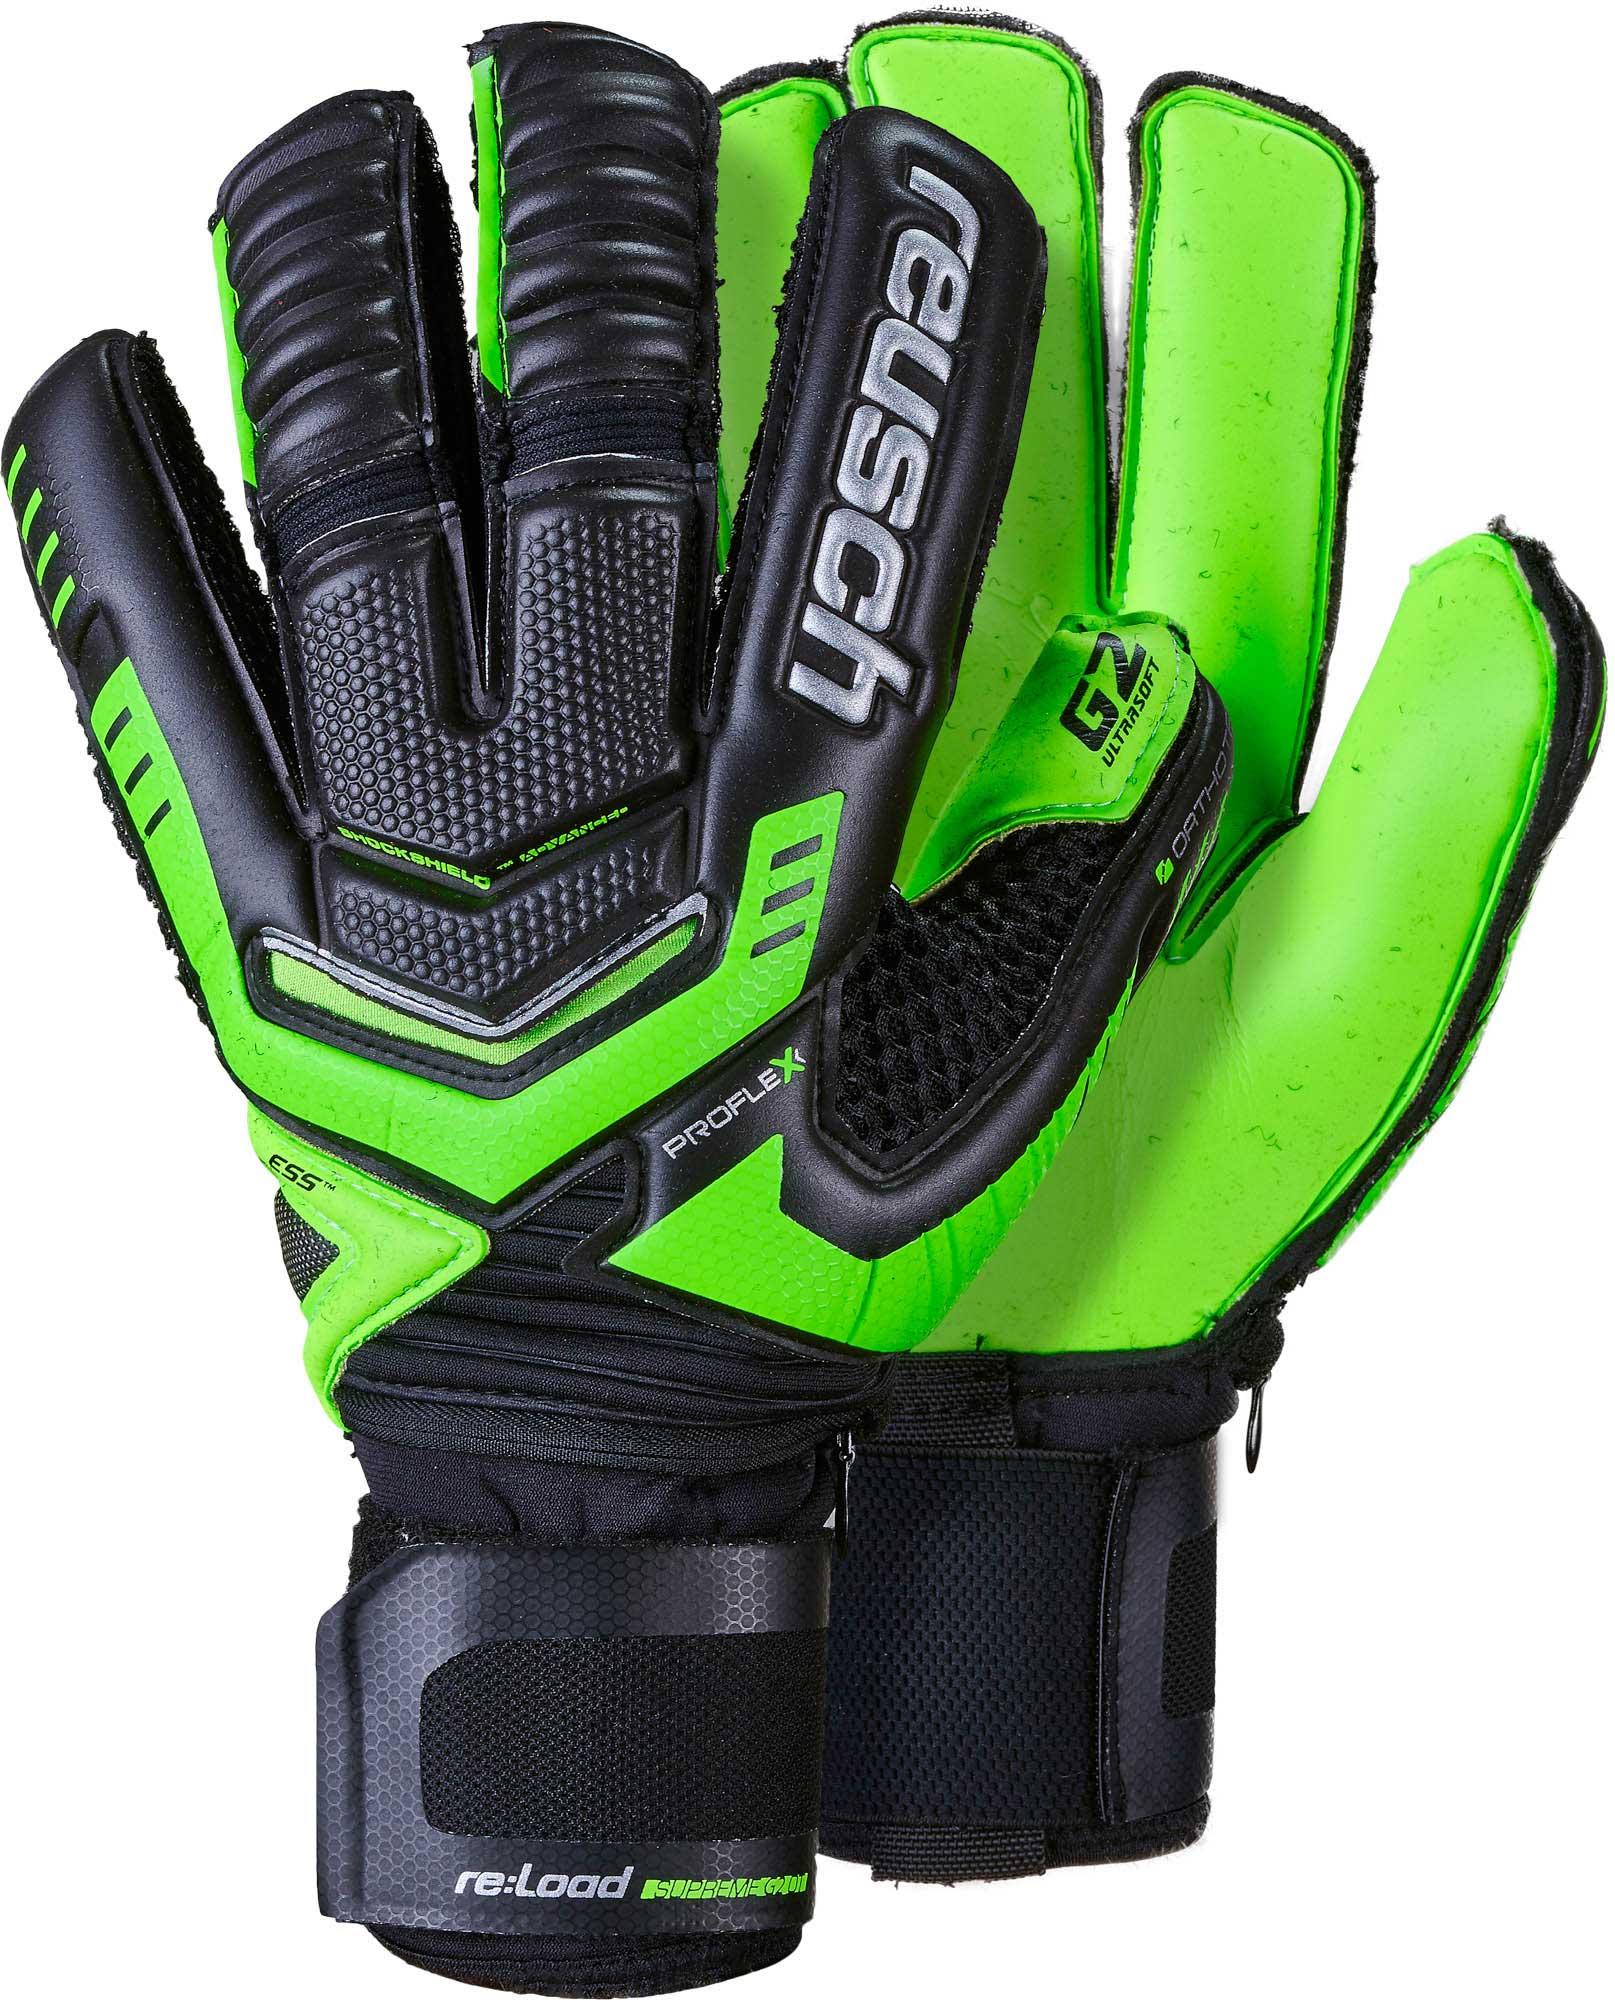 Reusch RE LOAD Supreme G2 Ortho-Tec Goalkeeper Gloves – Black Green da53bfe49